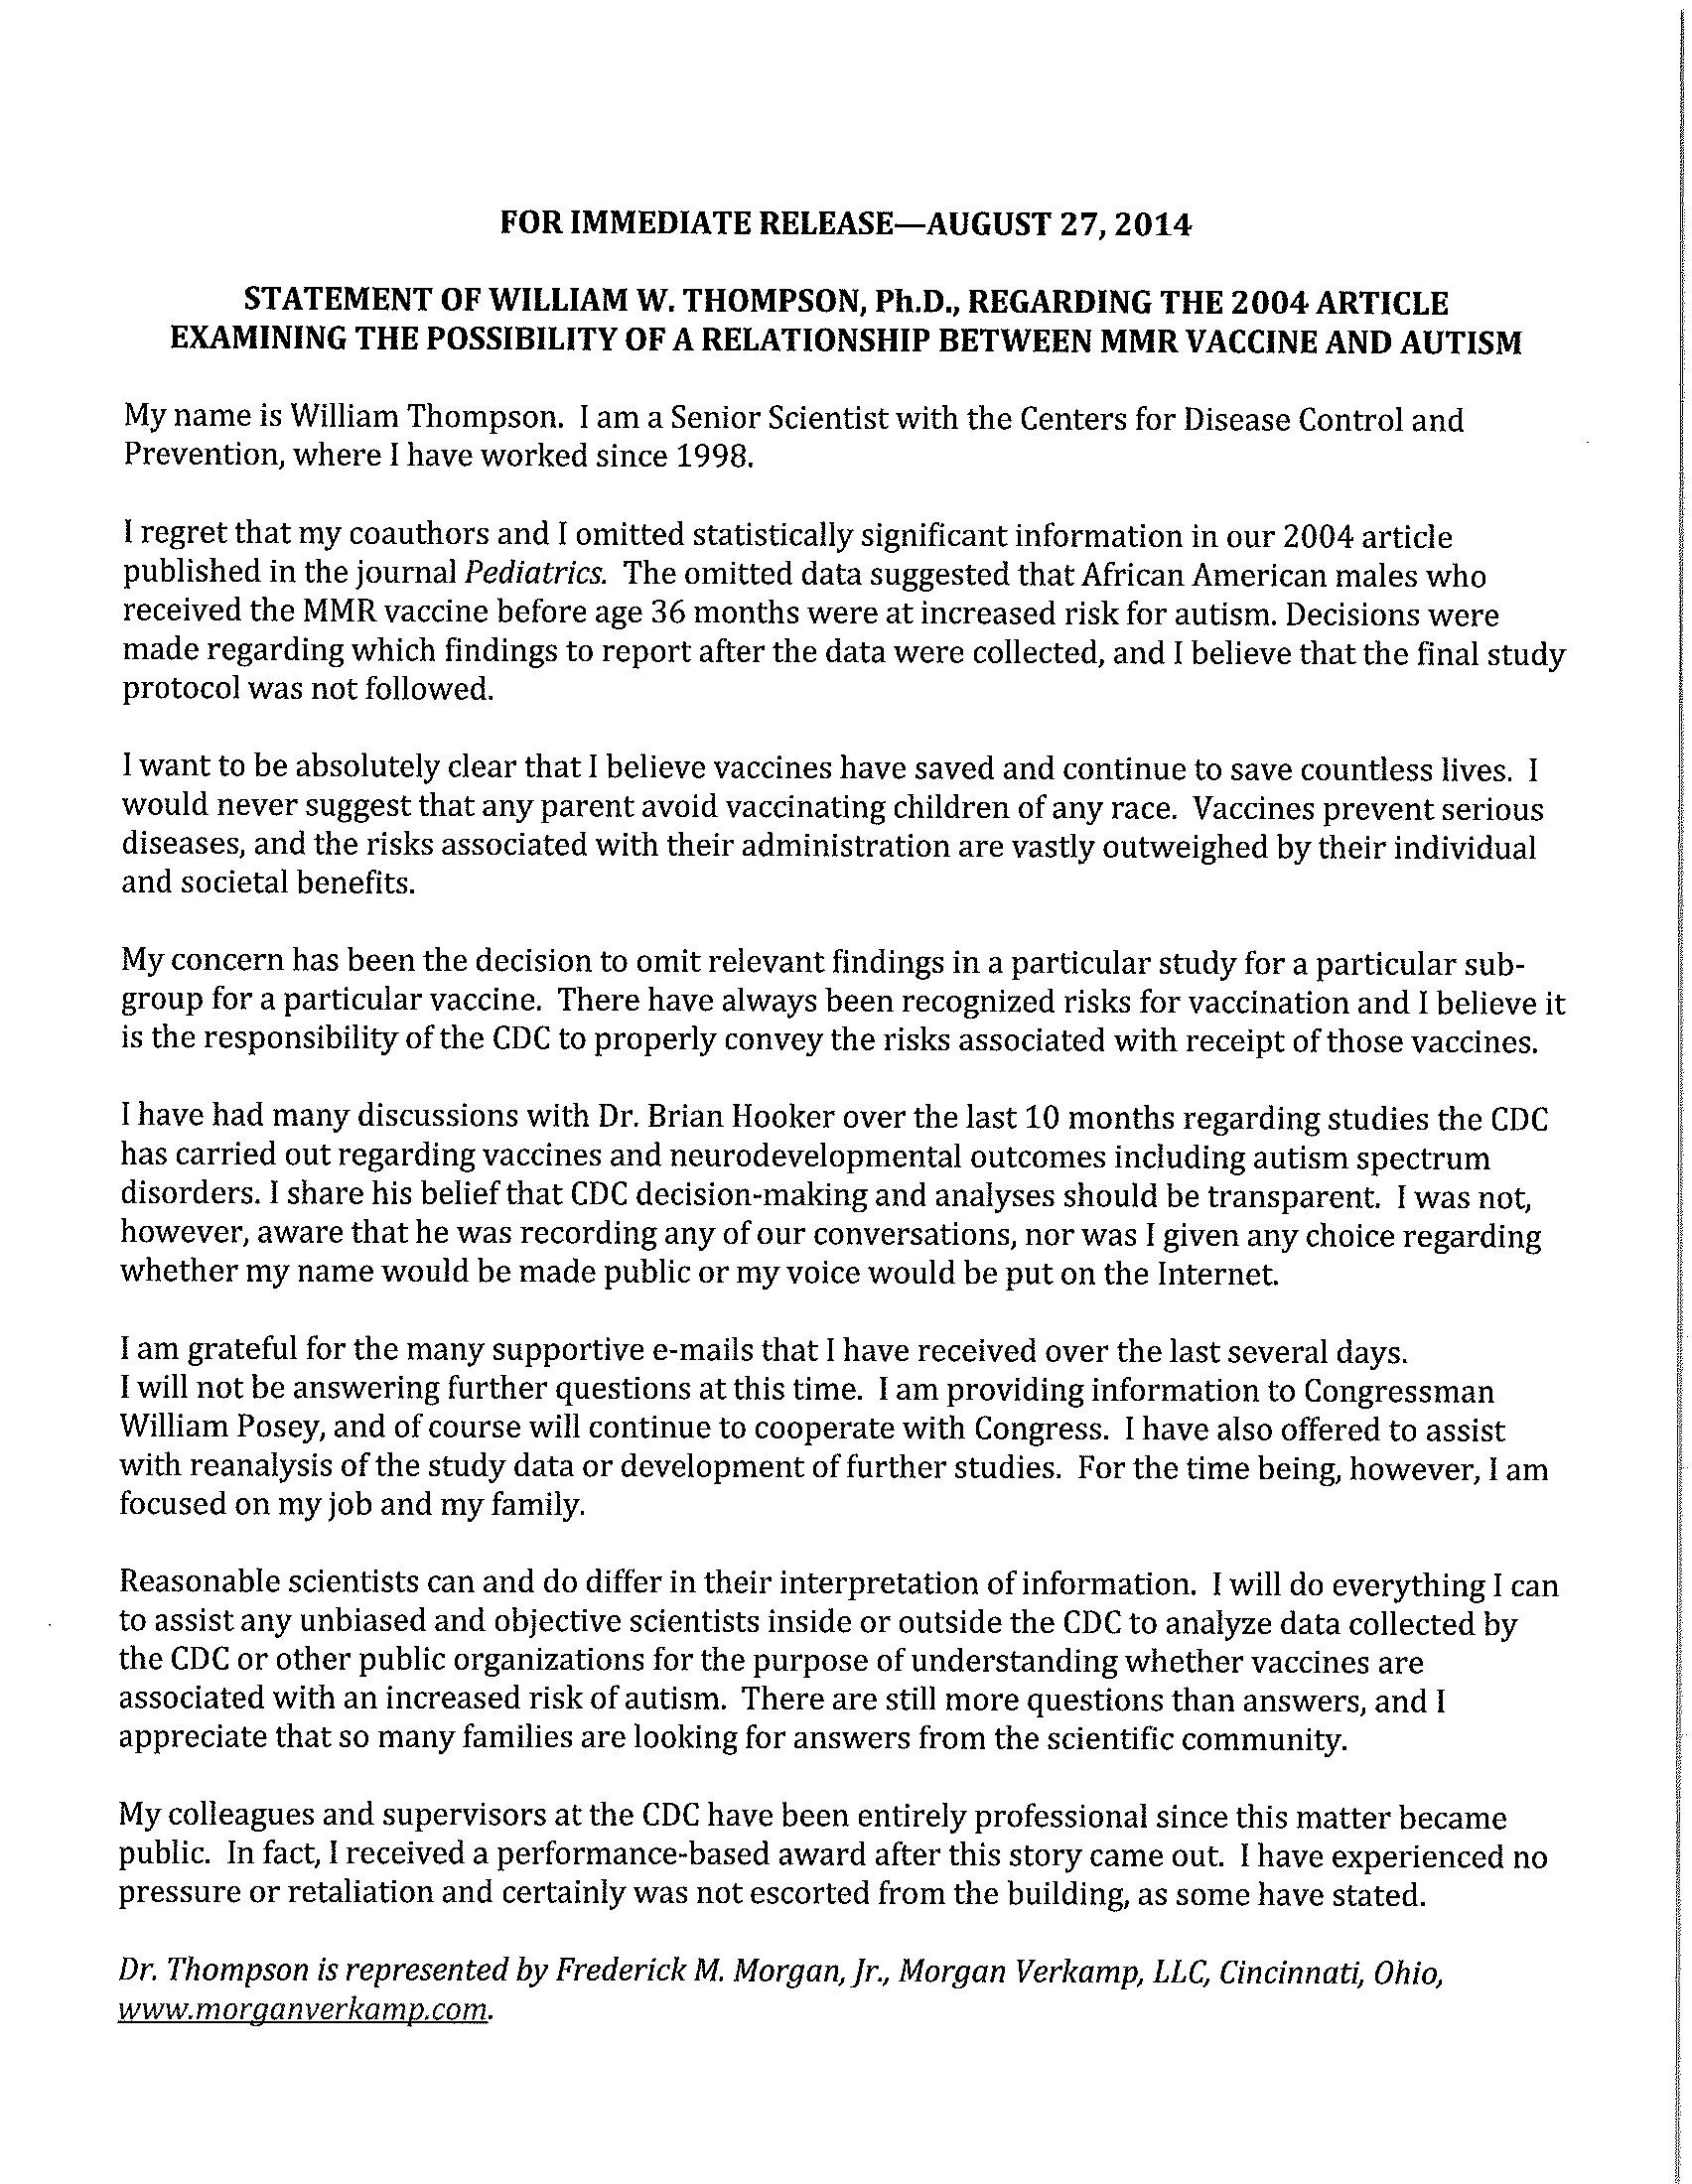 Statement from William Thompson RE Pediatrics MMR African